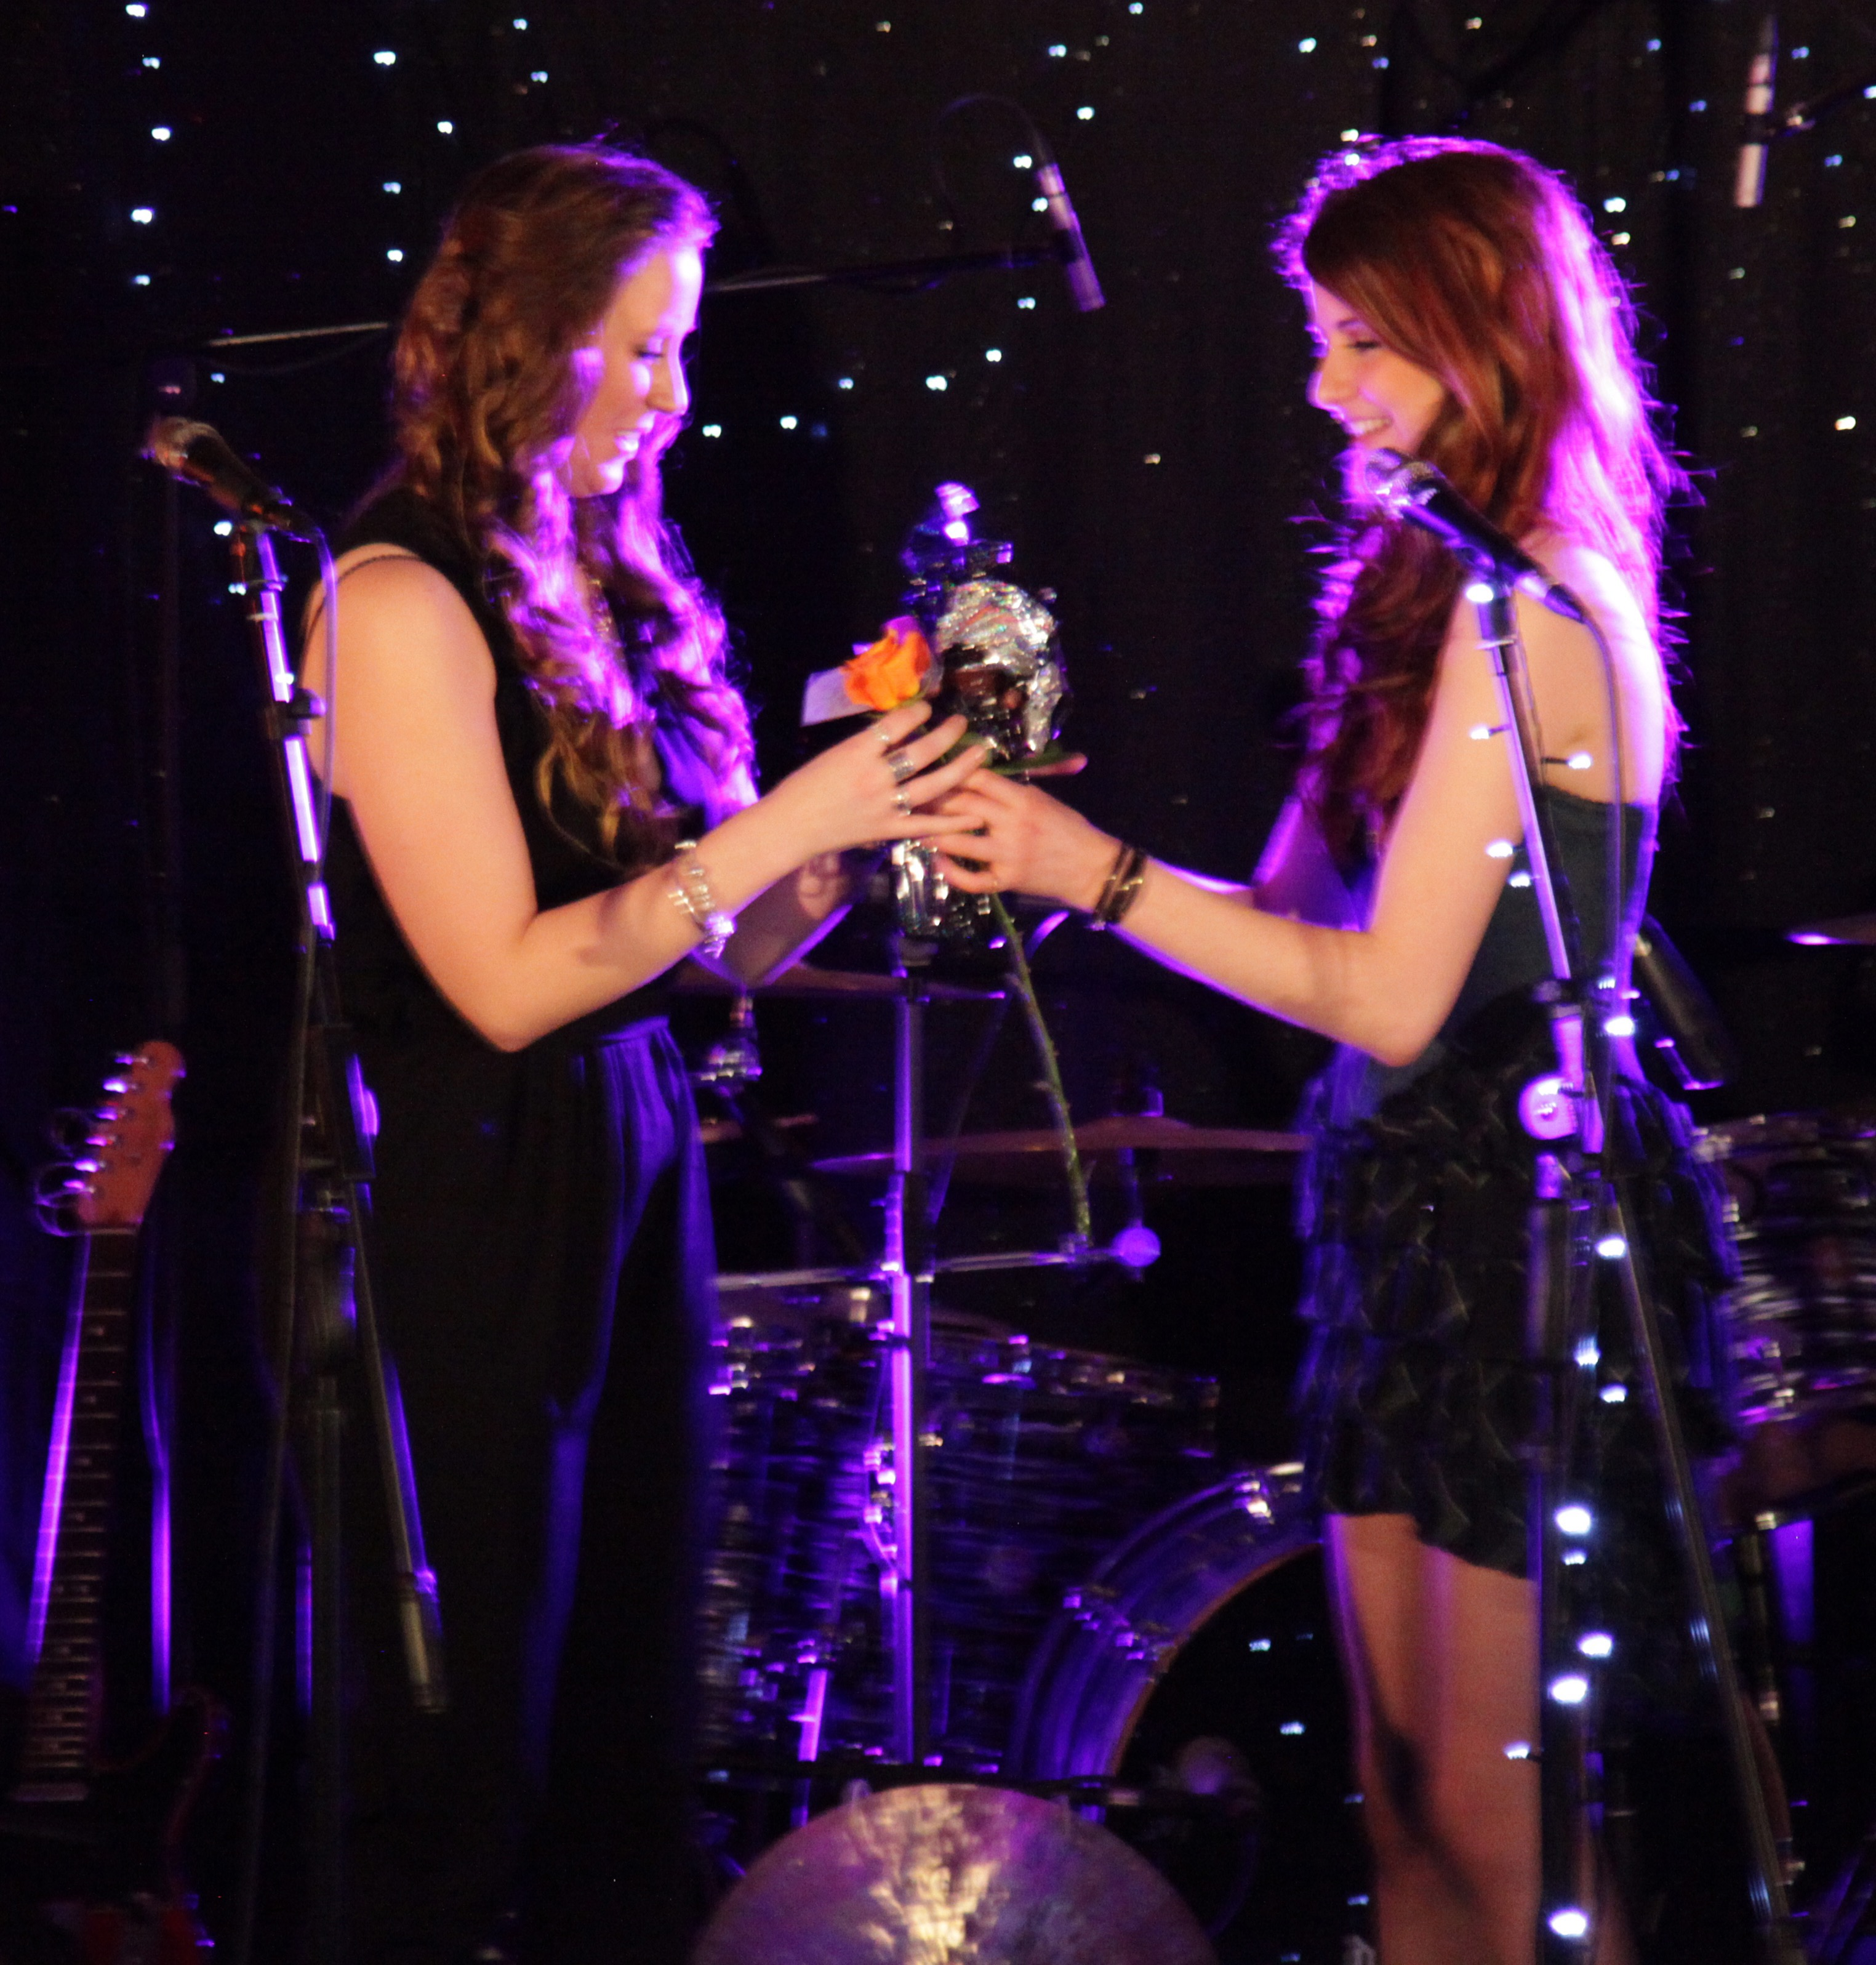 Toni Lenore and Molly Devine